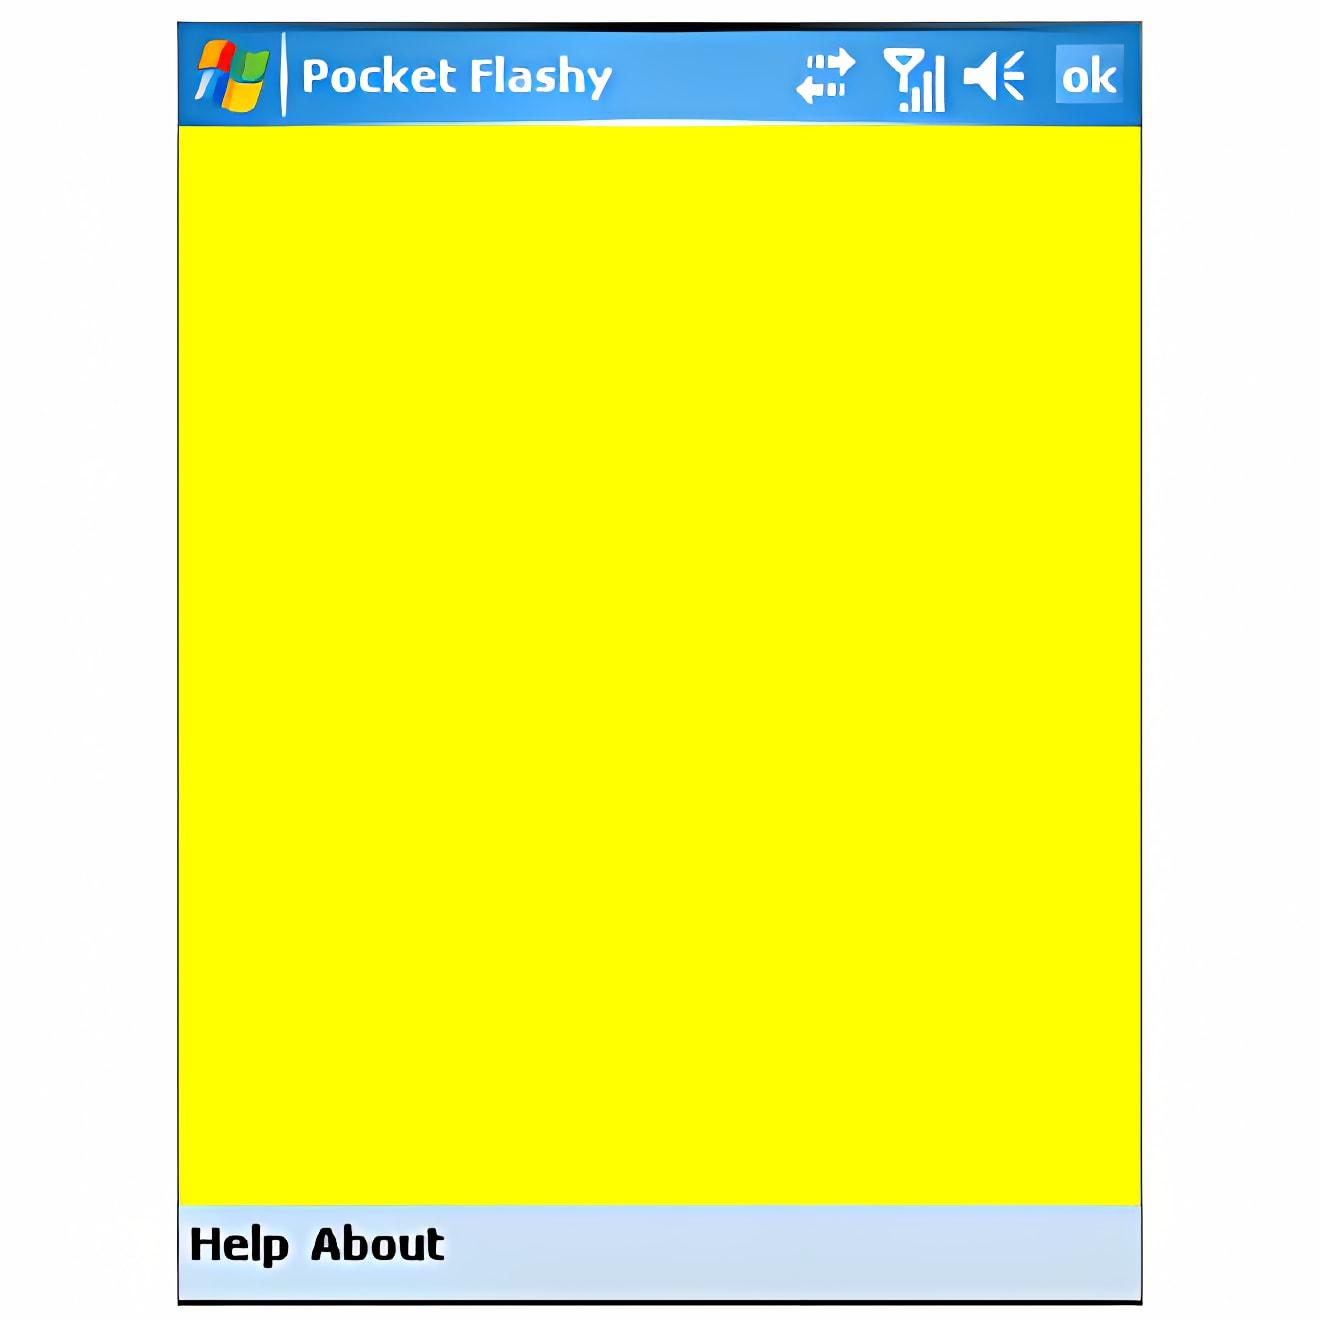 Pocket Flashy